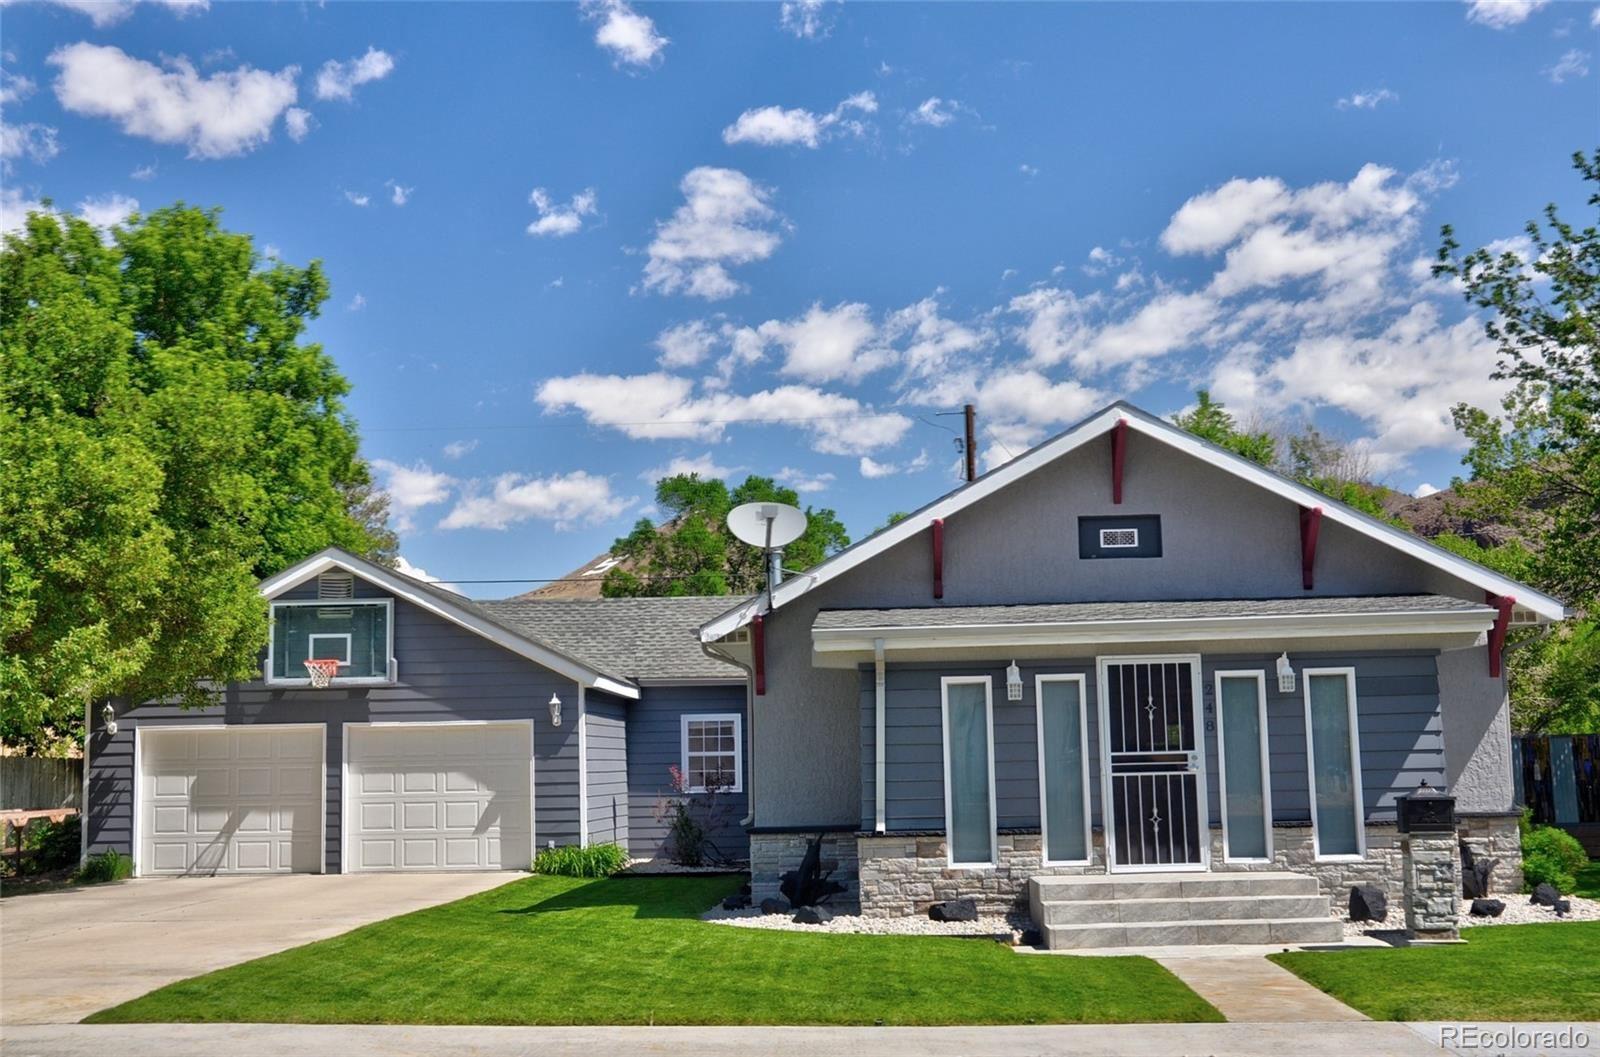 248 Wood Avenue, Salida, CO 81201 - #: 7212418